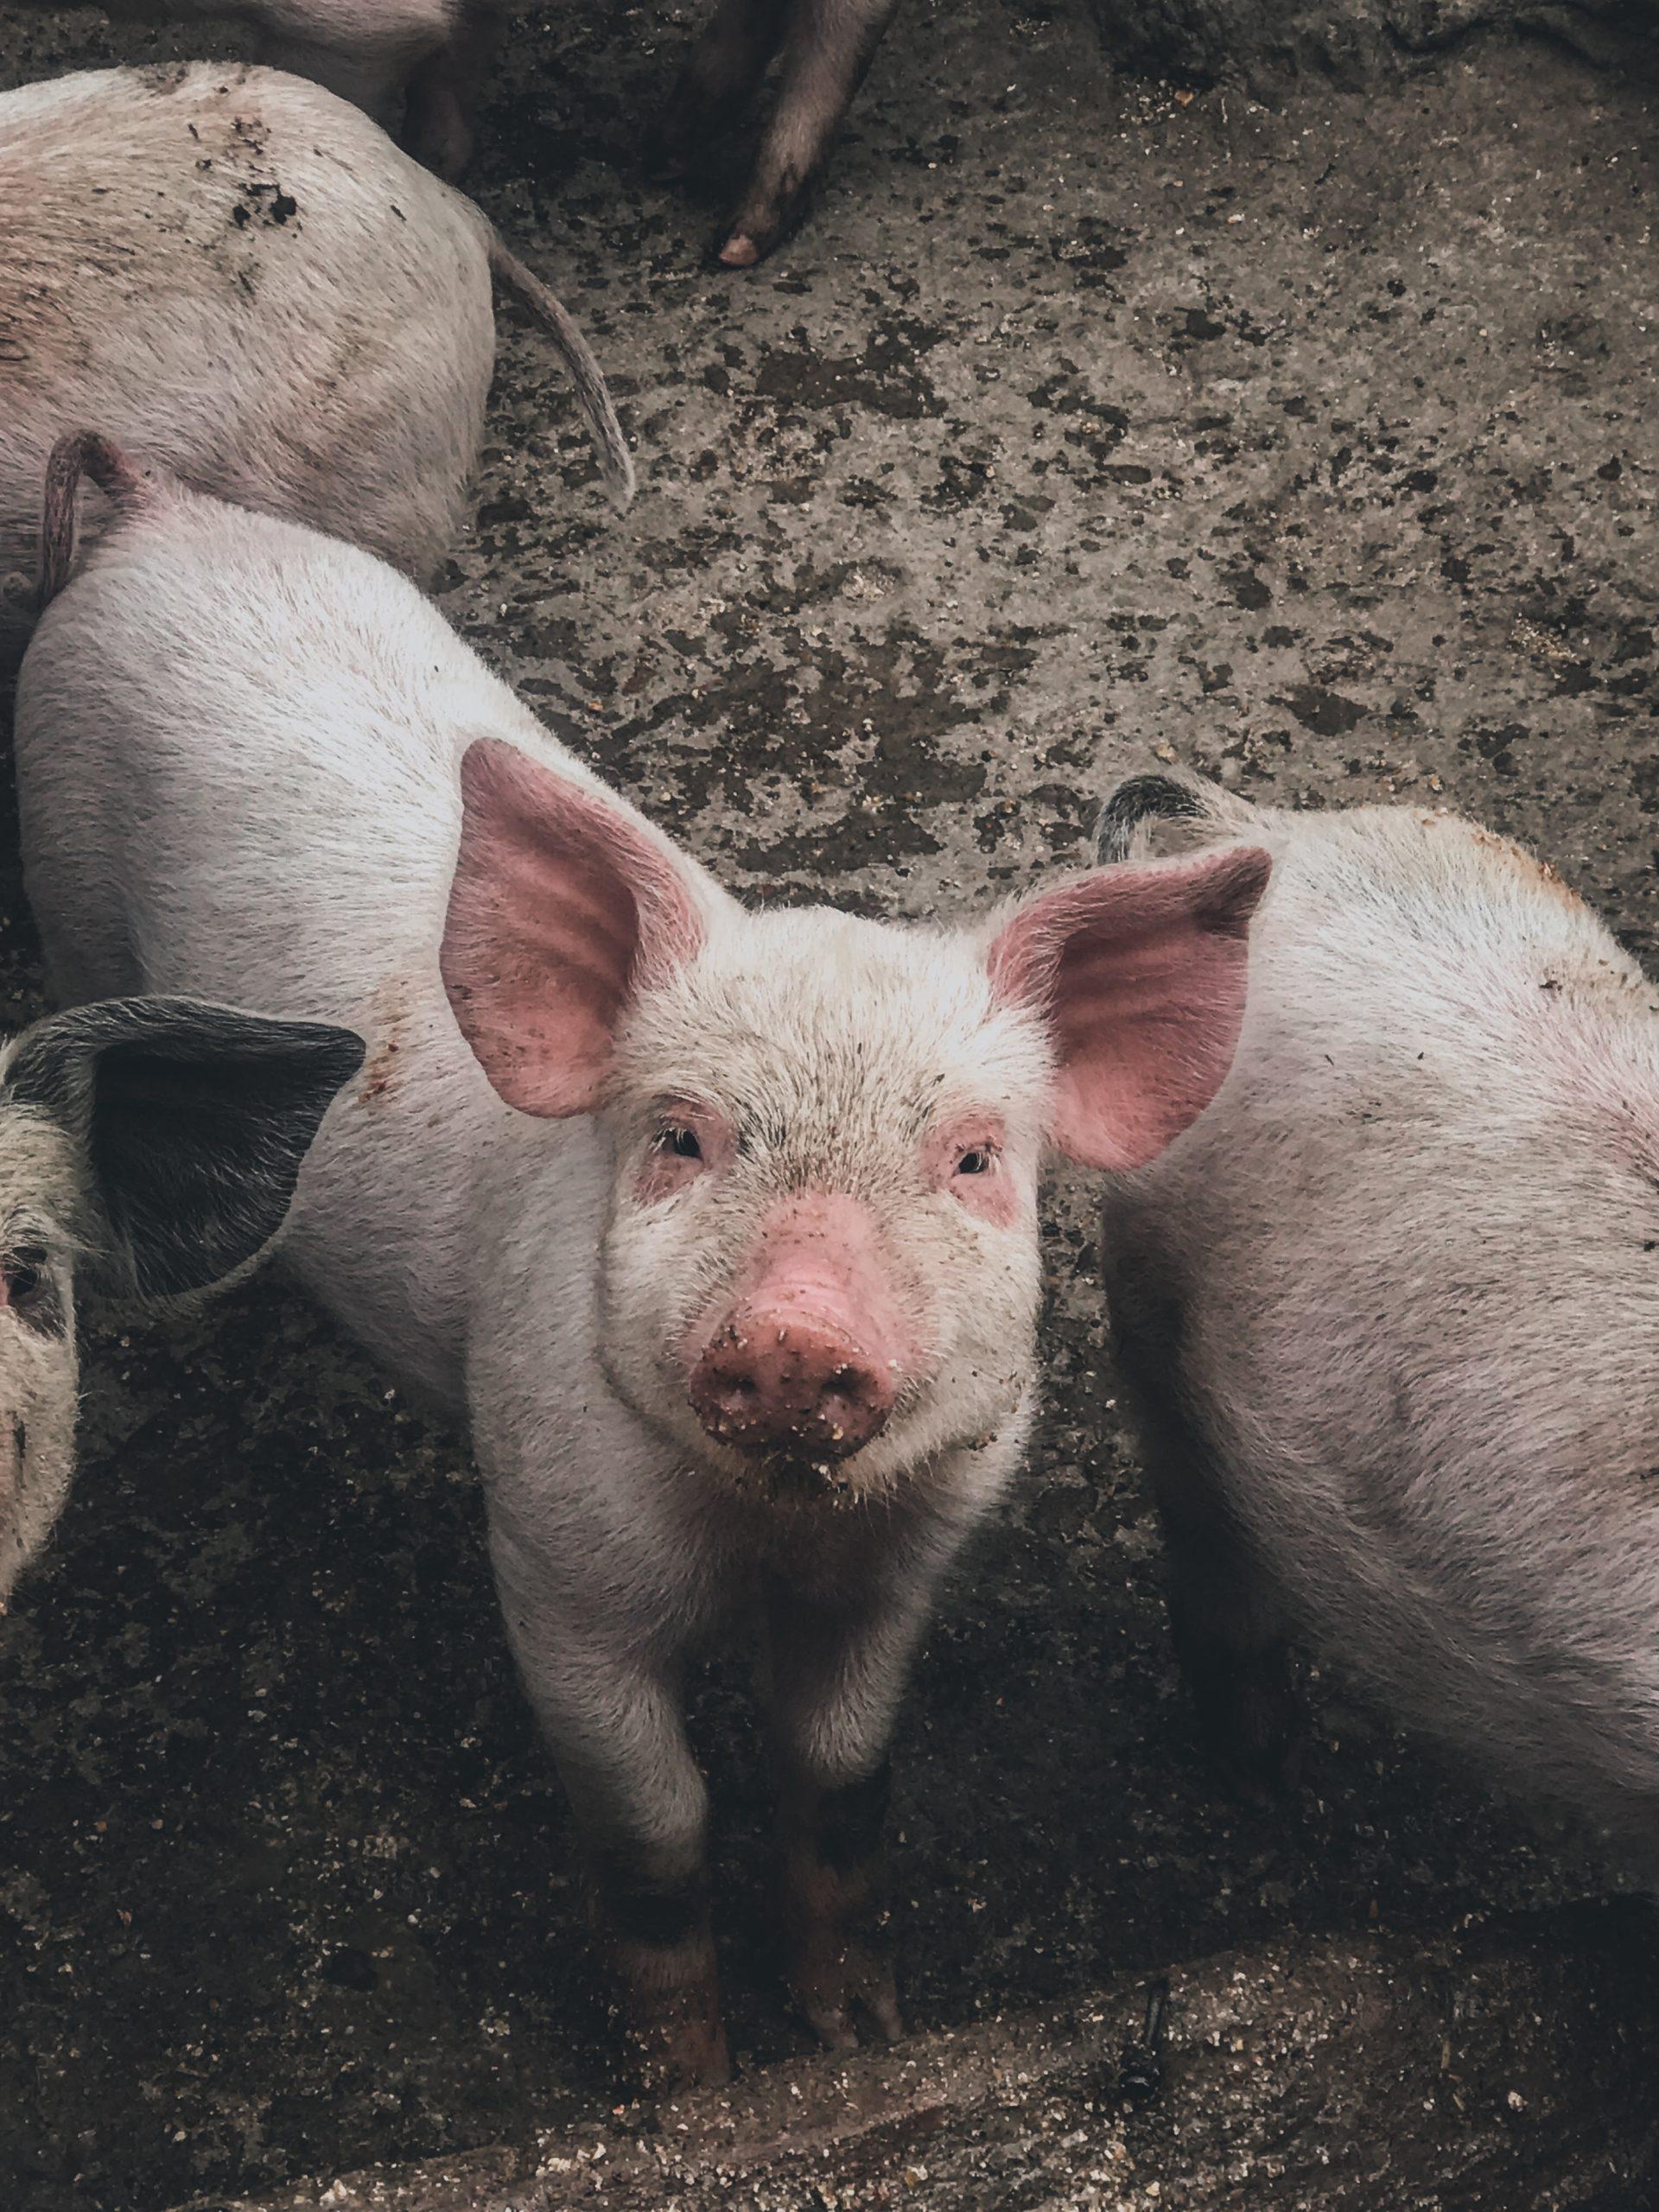 pigs walking around in pig slop and mud